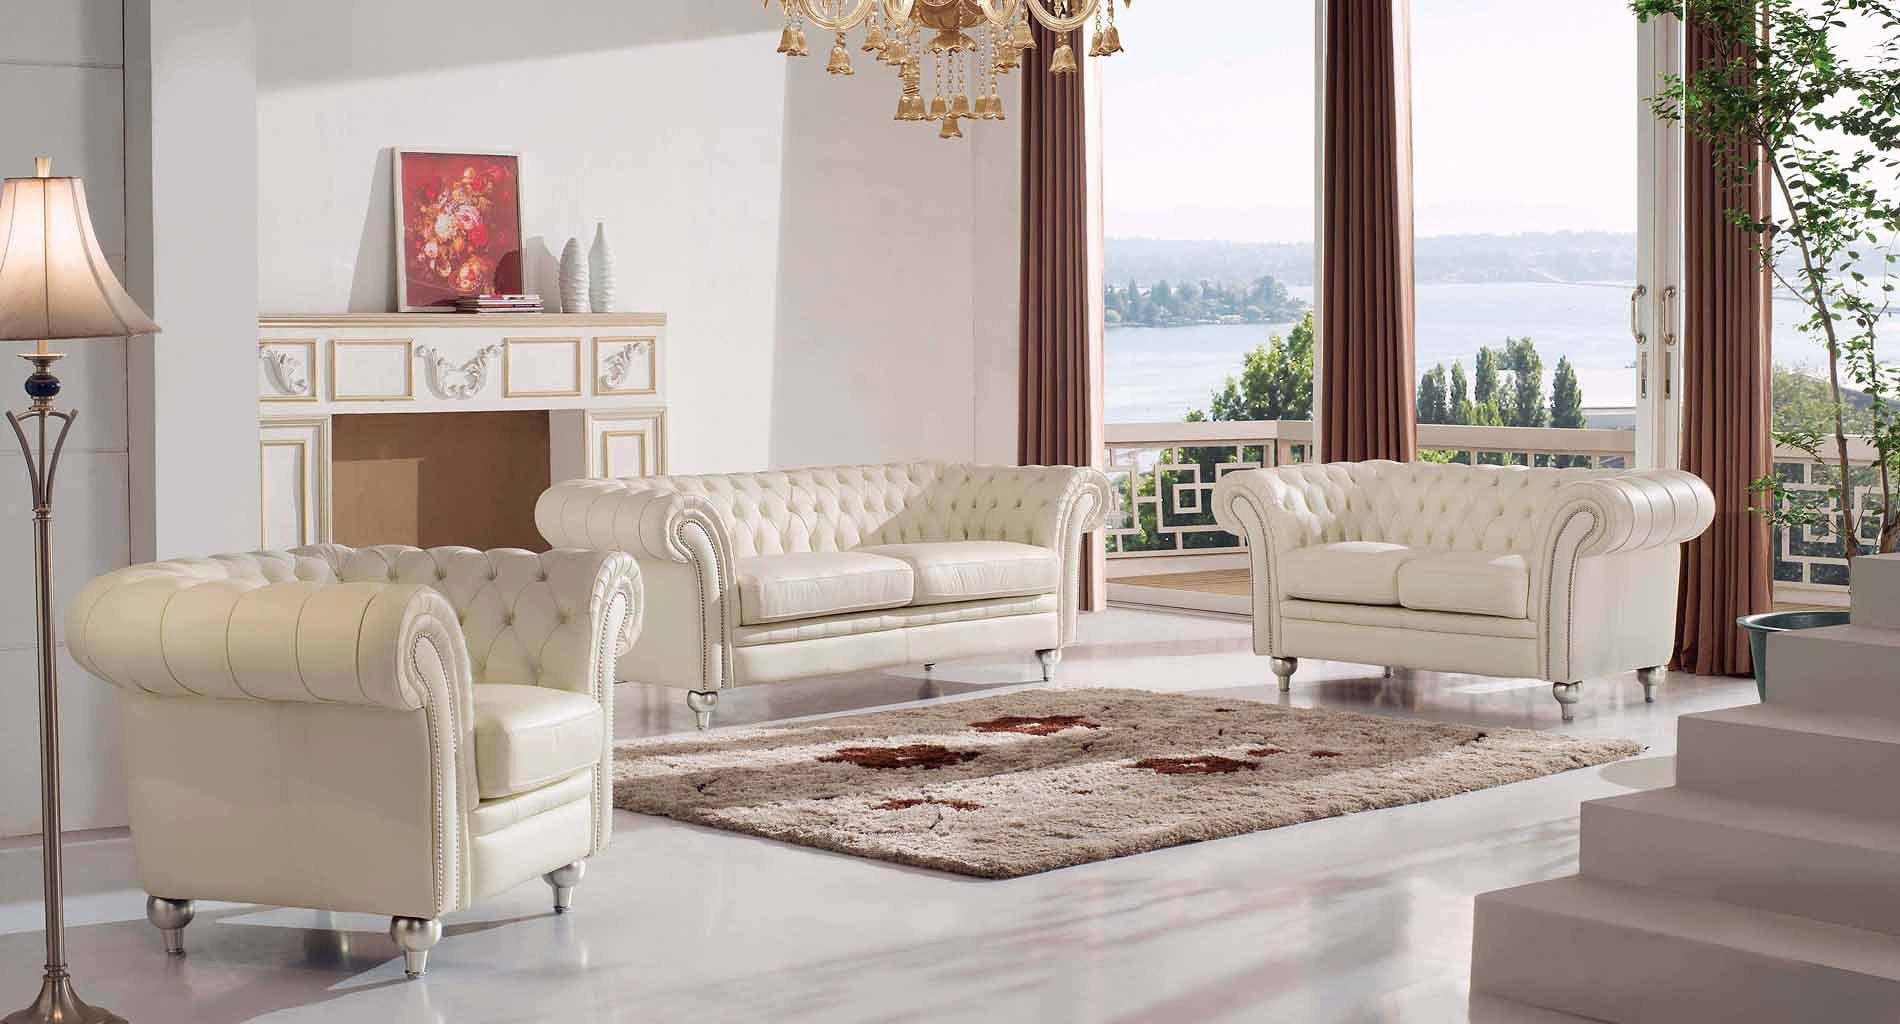 287 Tufted Cream Living Room Setmedia Image